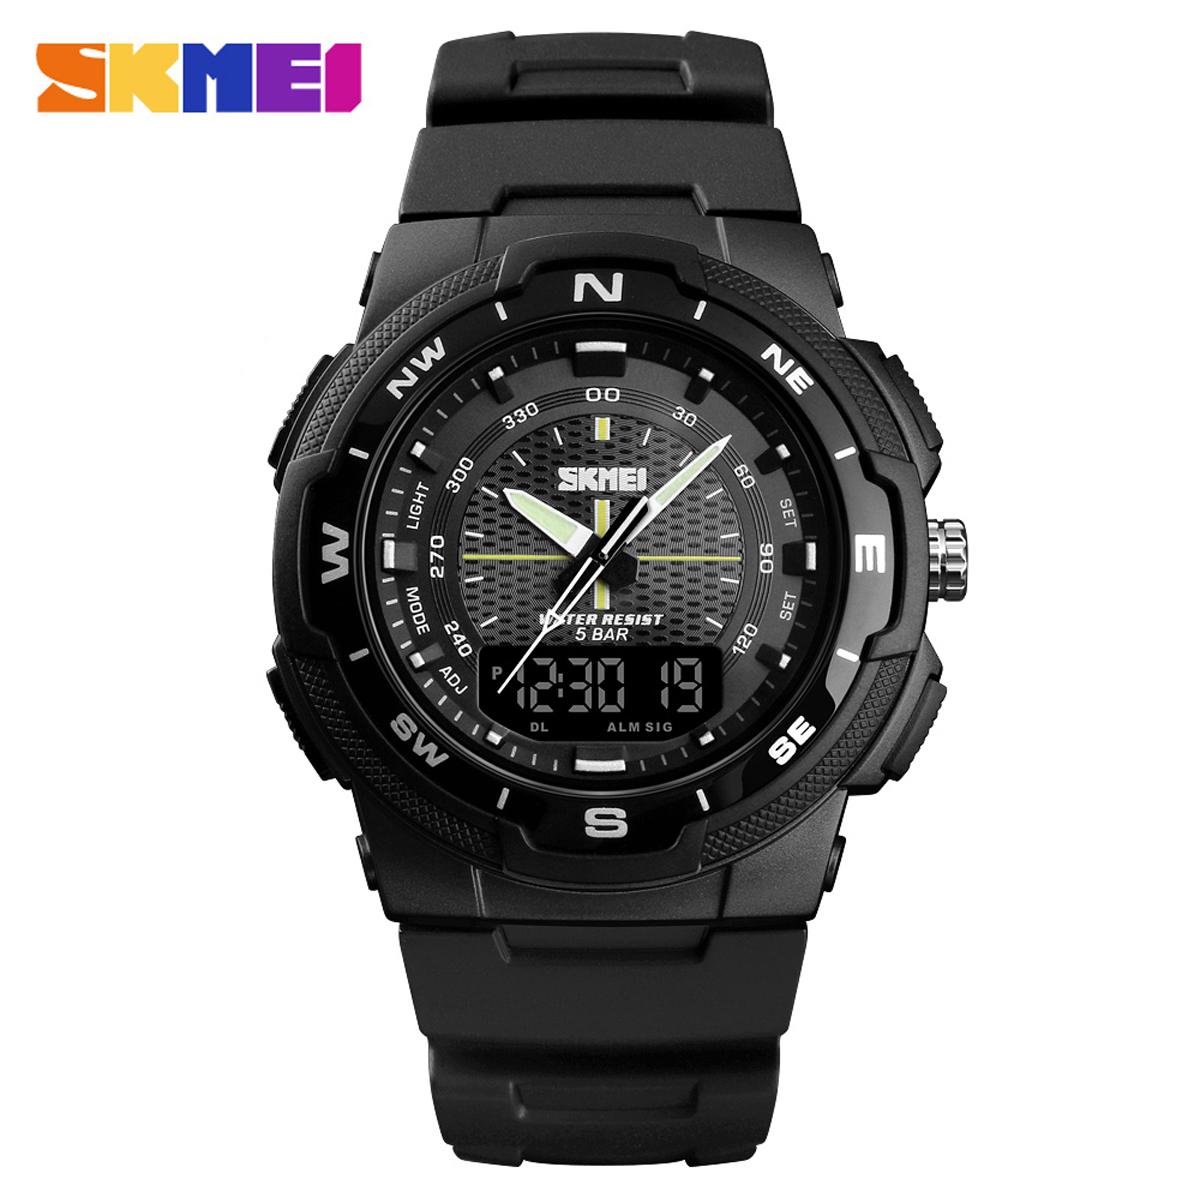 SKMEI Dual Display Analog & DIgital Military Sports Wrist Watch For (Men & Boys)- 1454